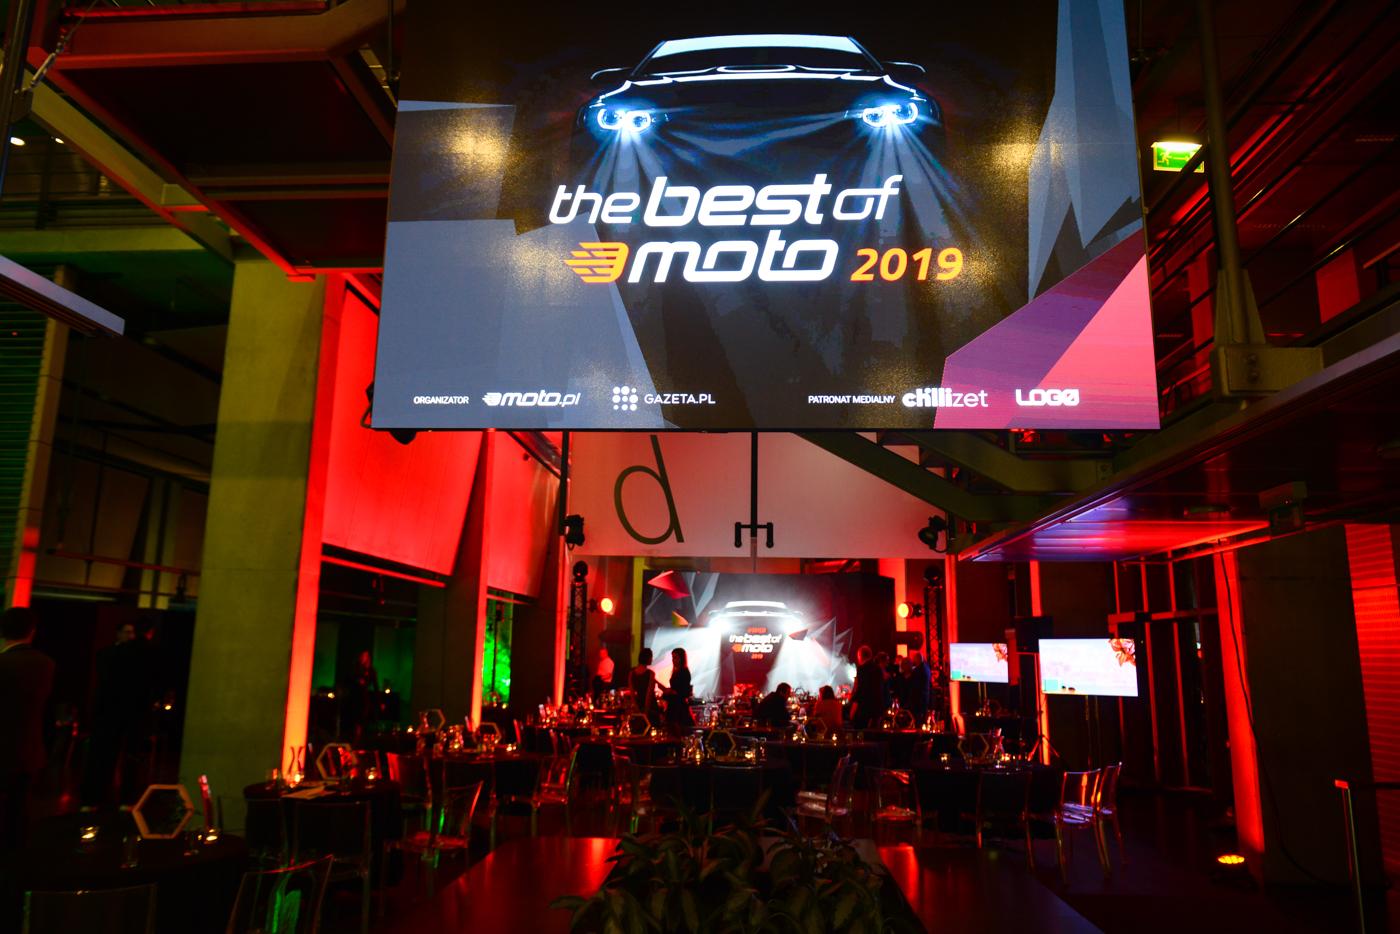 BlogStar: The Best of Moto  - znamy najlepszy samochód 2019 roku! - BlogStar.pl